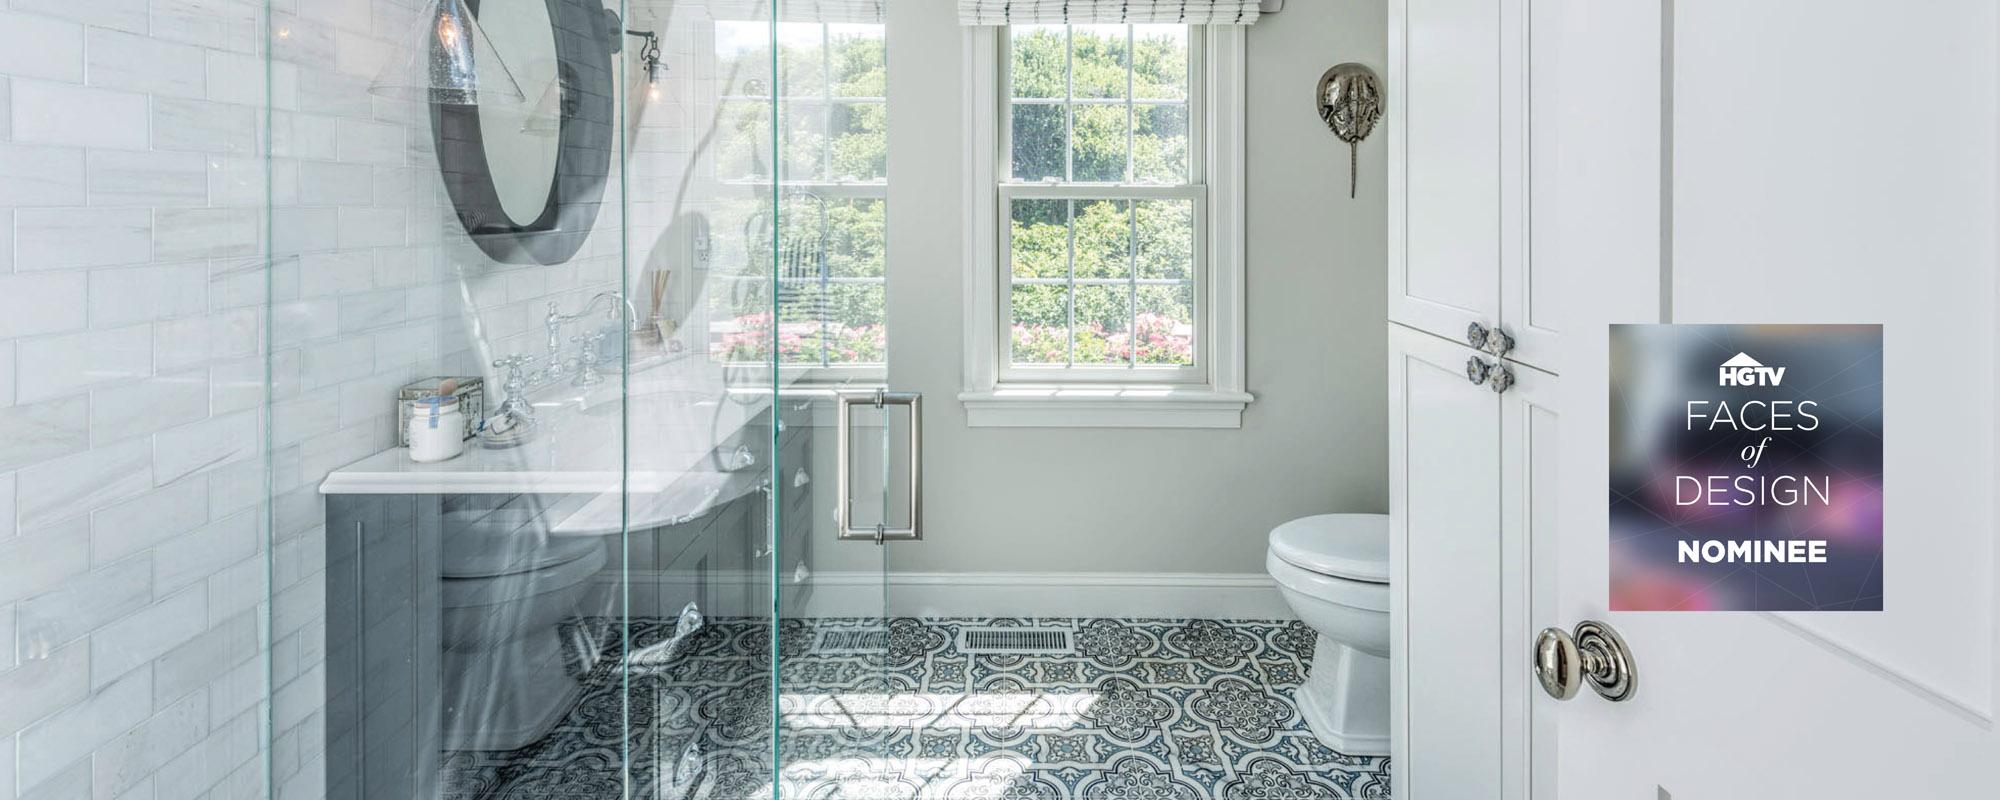 hgtv-casa-homepage-bath